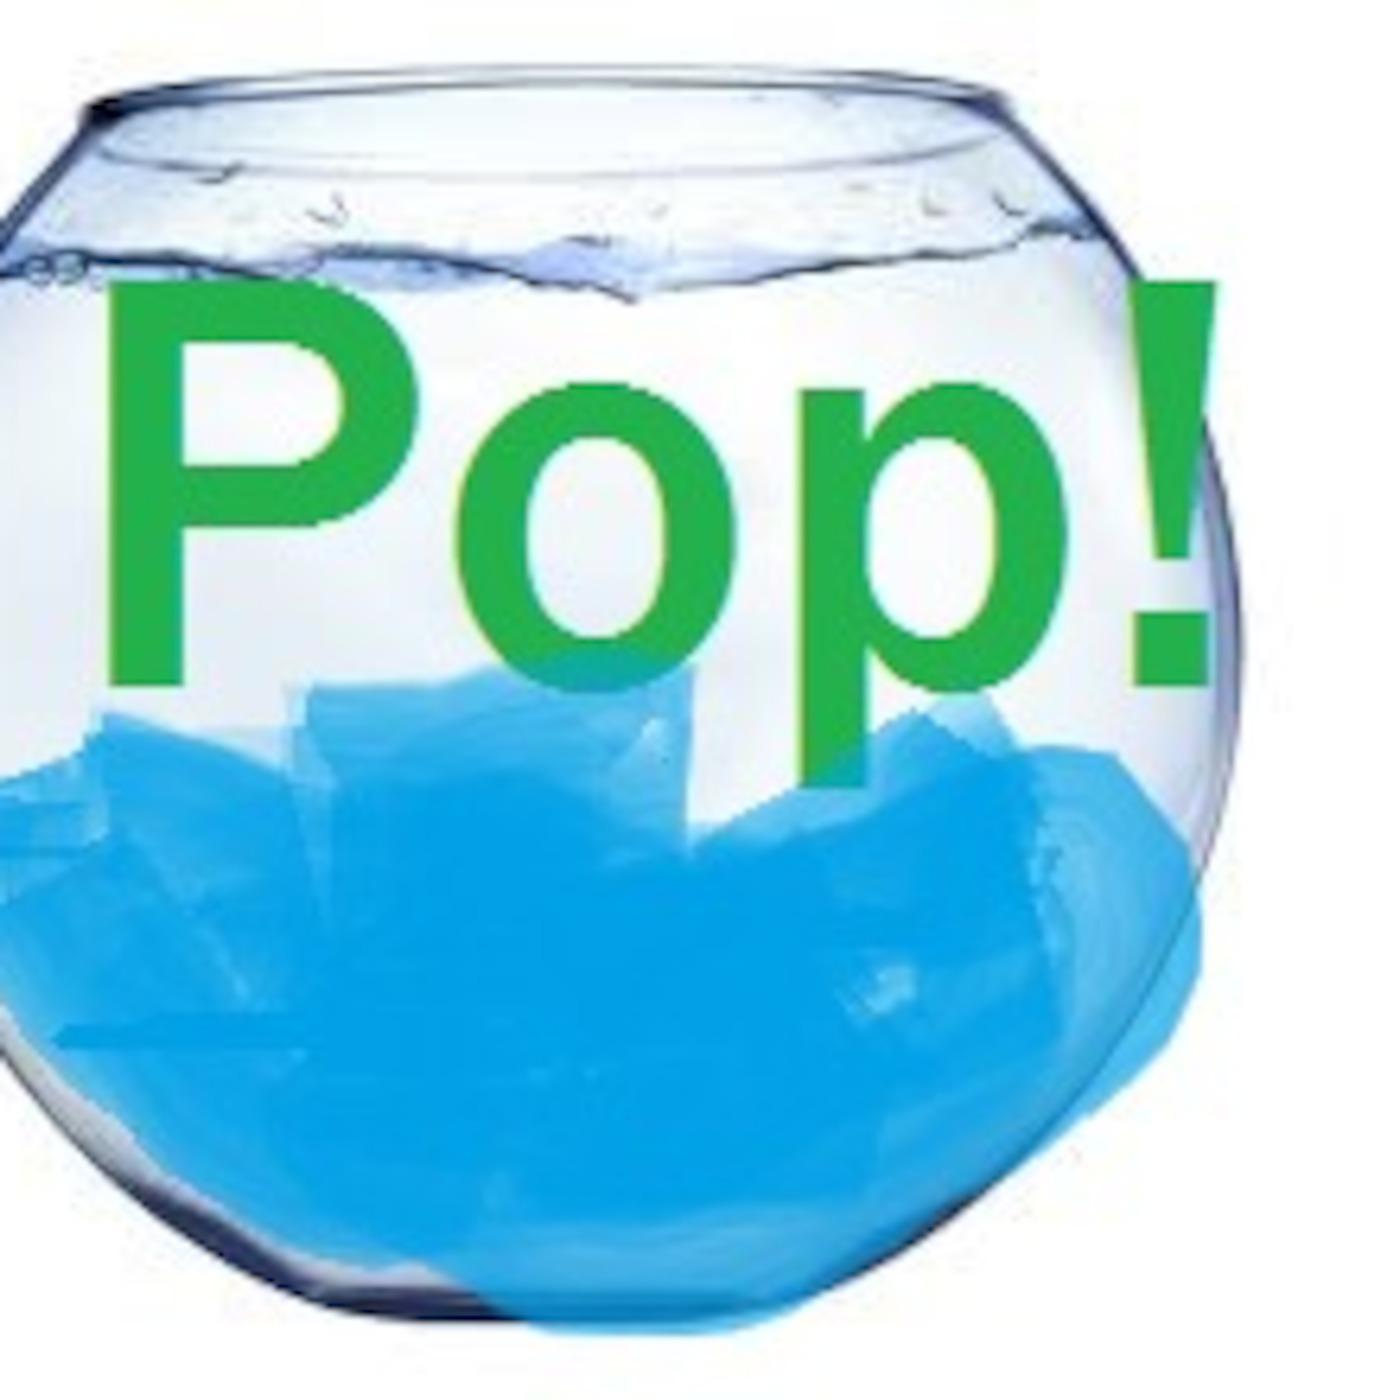 Pop! Fishbowl | Listen Free on Castbox